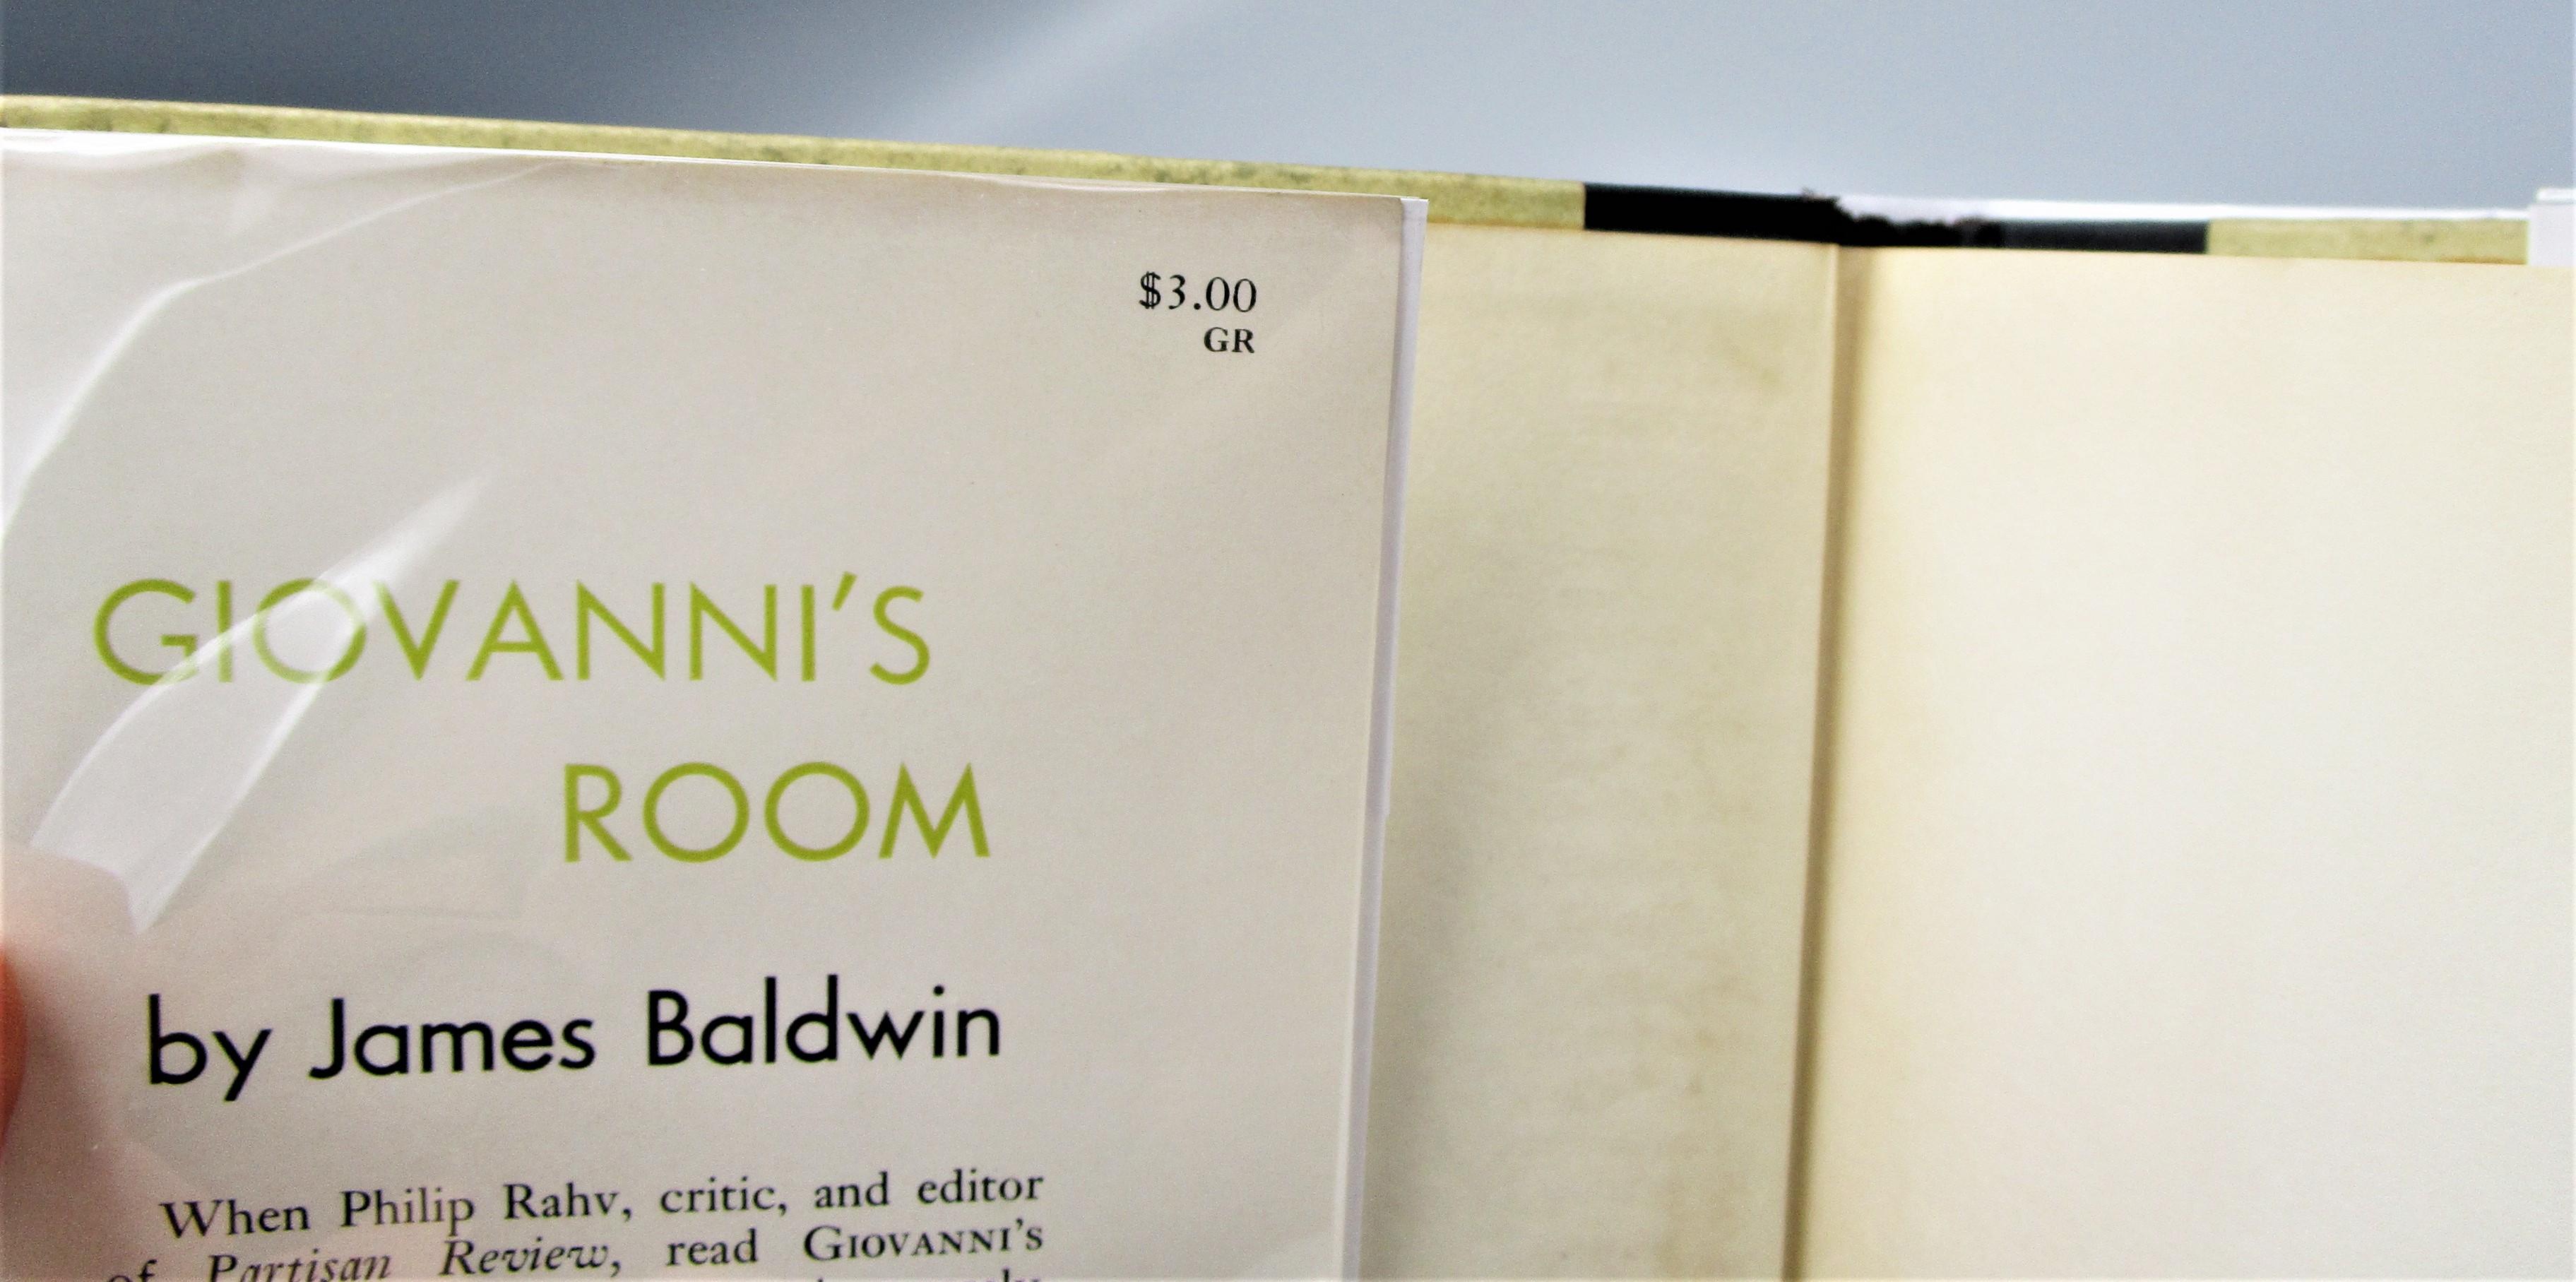 GIOVANNI'S ROOM, by James Baldwin - 1956 [1st US Ed]